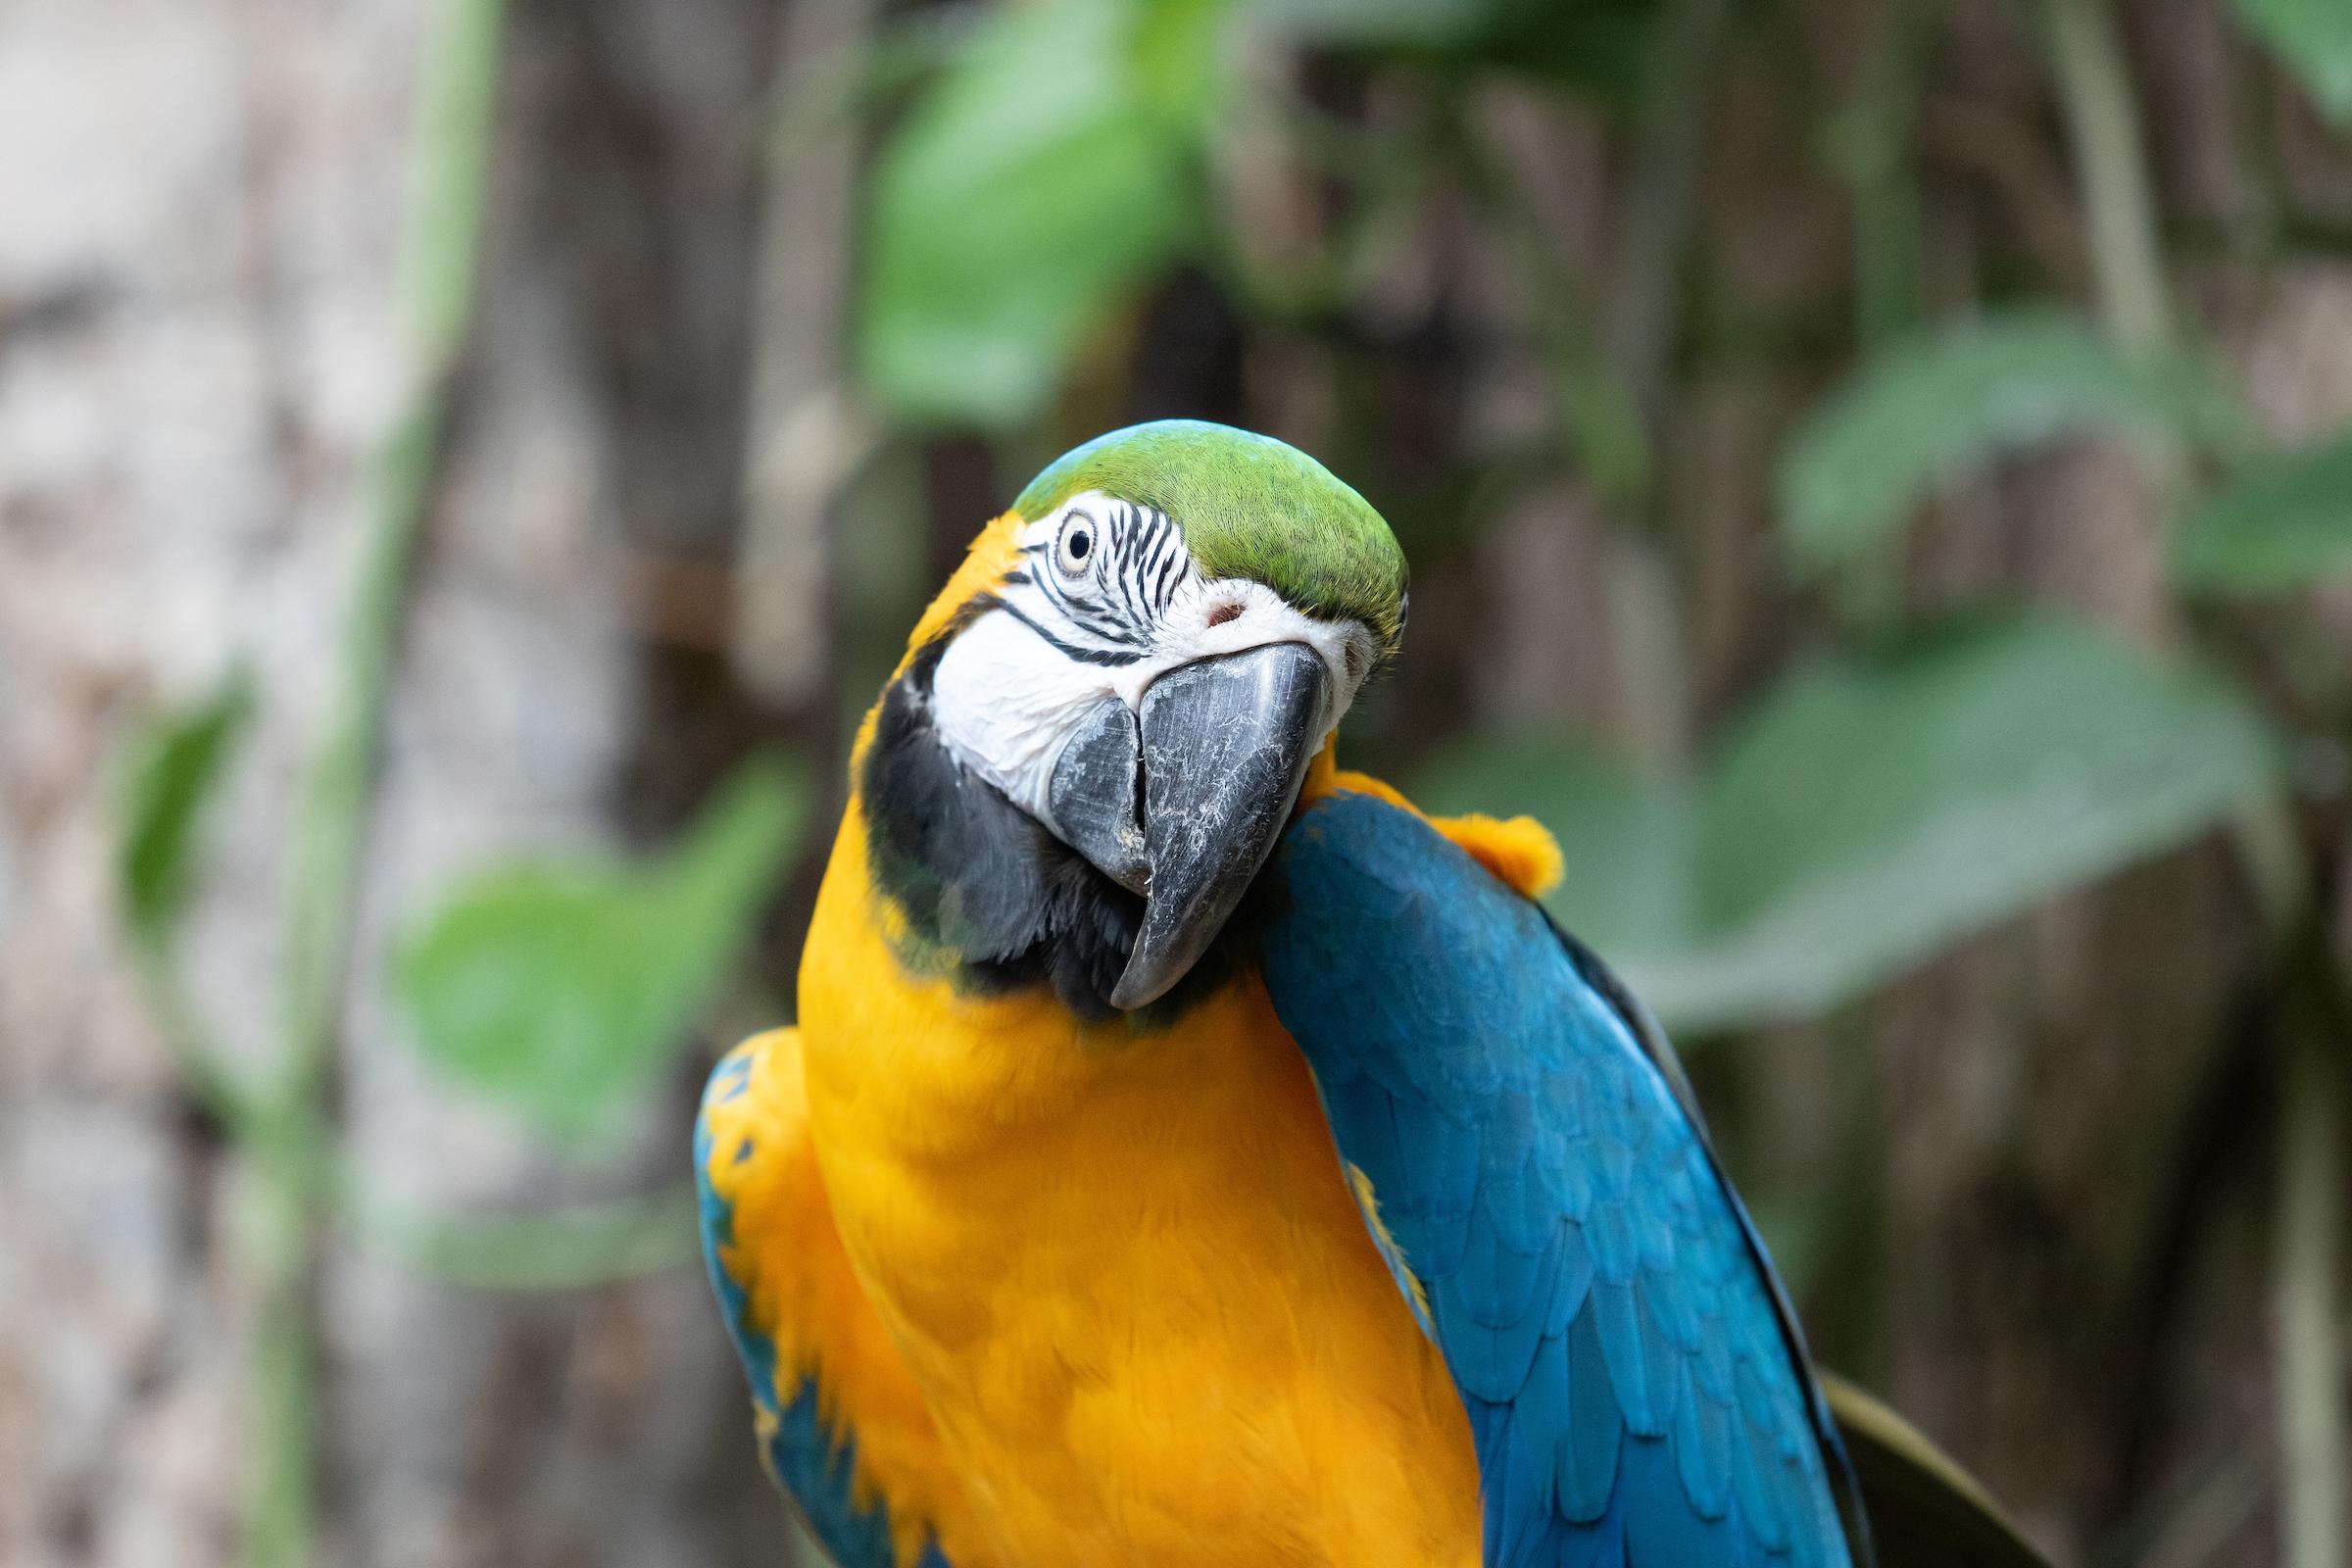 Audubon Aquarium and Audubon Zoo Nominated for USA TODAY 10Best Readers' Choice Awards